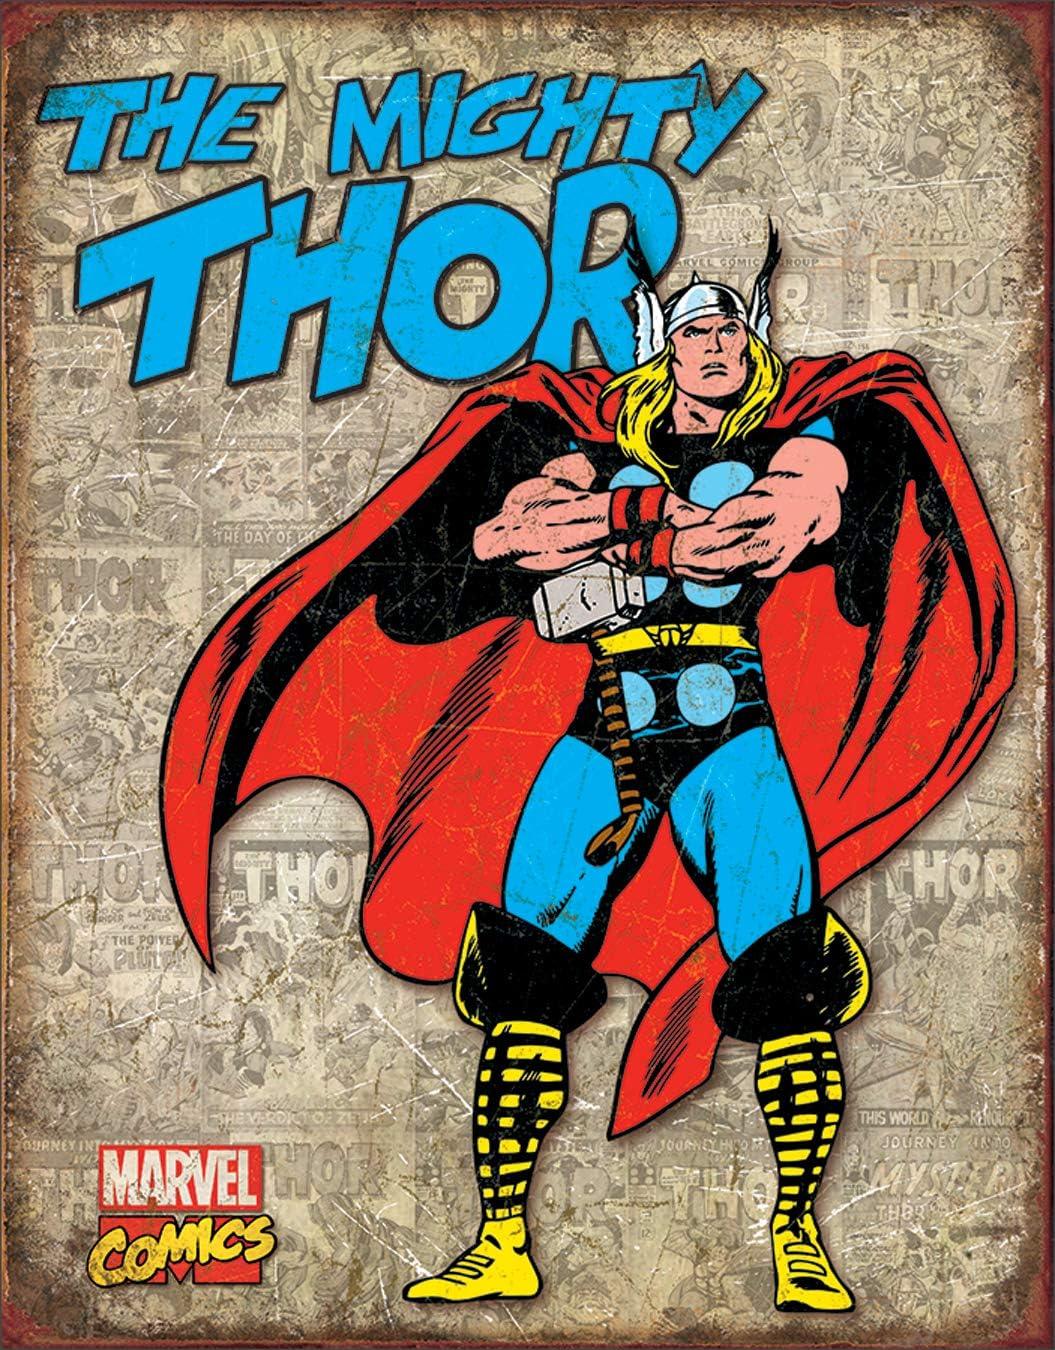 "Desperate Enterprises Marvel Comics Thor Retro Cover Panels Tin Sign, 12.5"" W x 16"" H"